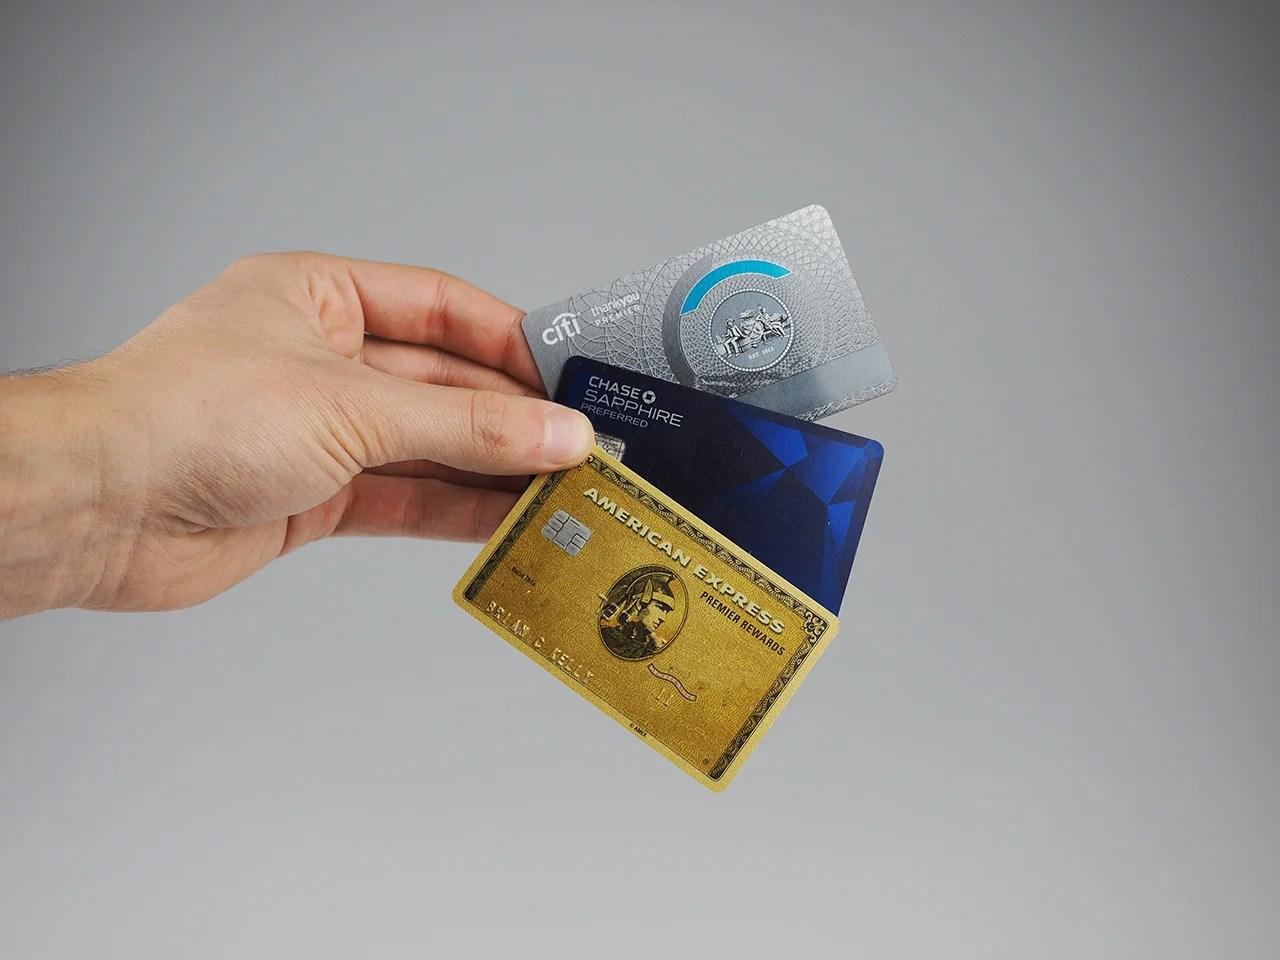 Showdown: ThankYou Premier vs Sapphire Preferred vs Premier Rewards Gold